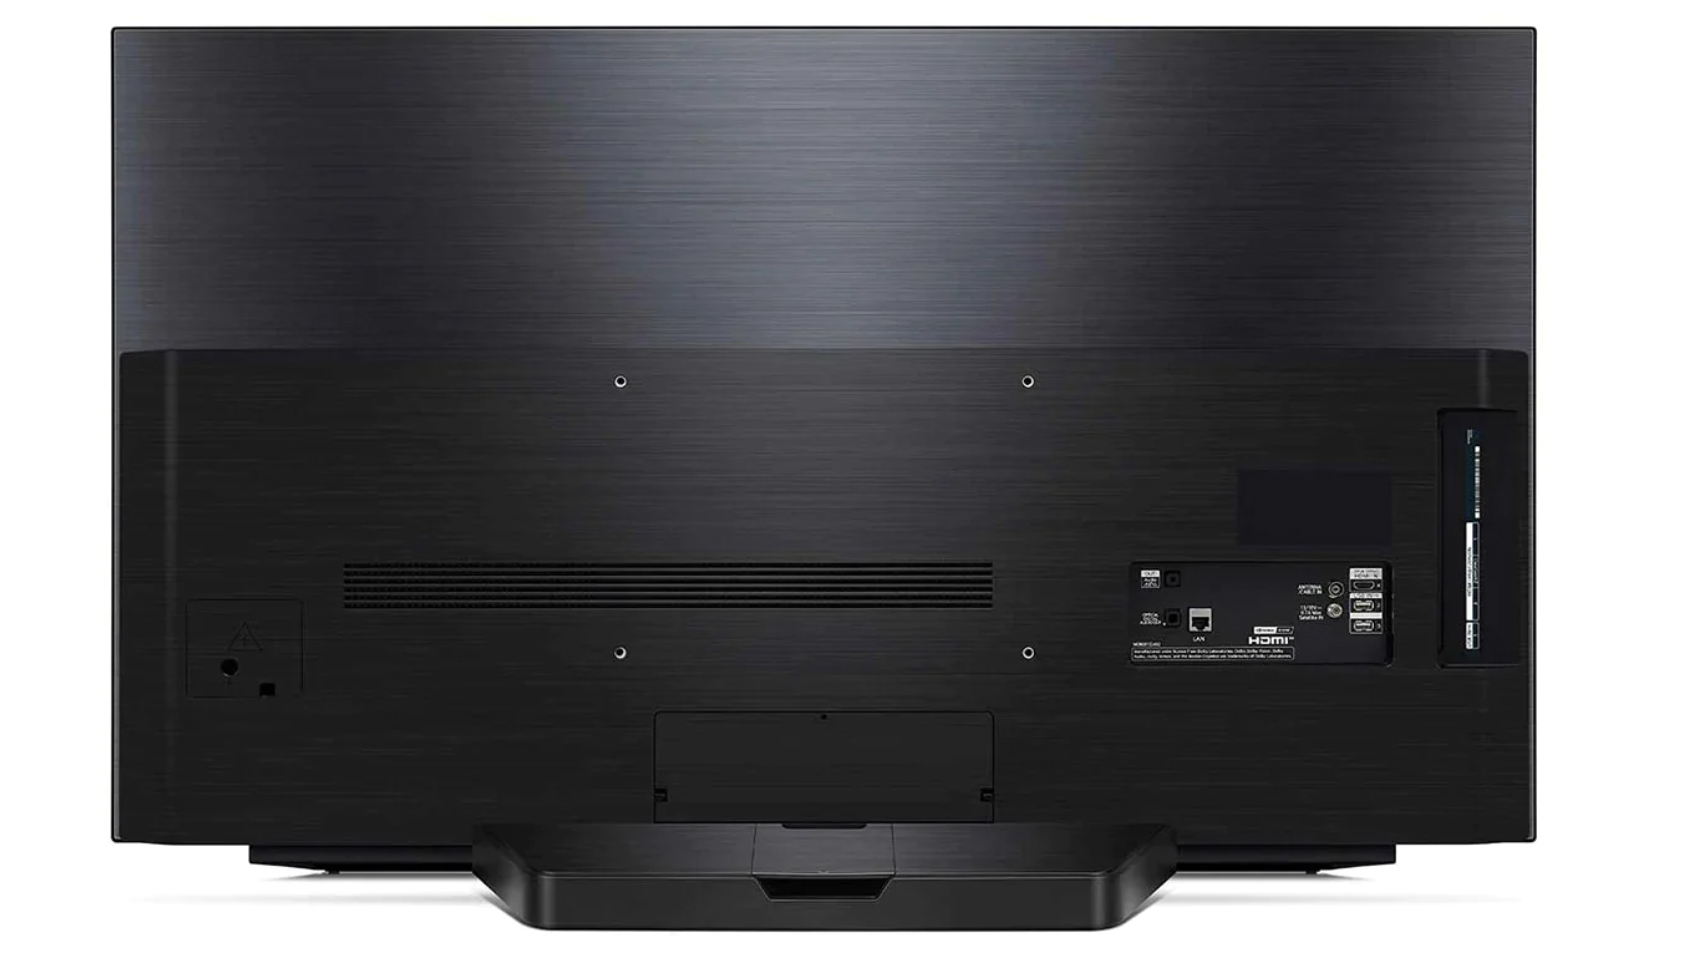 48-inch LG CX TV Back